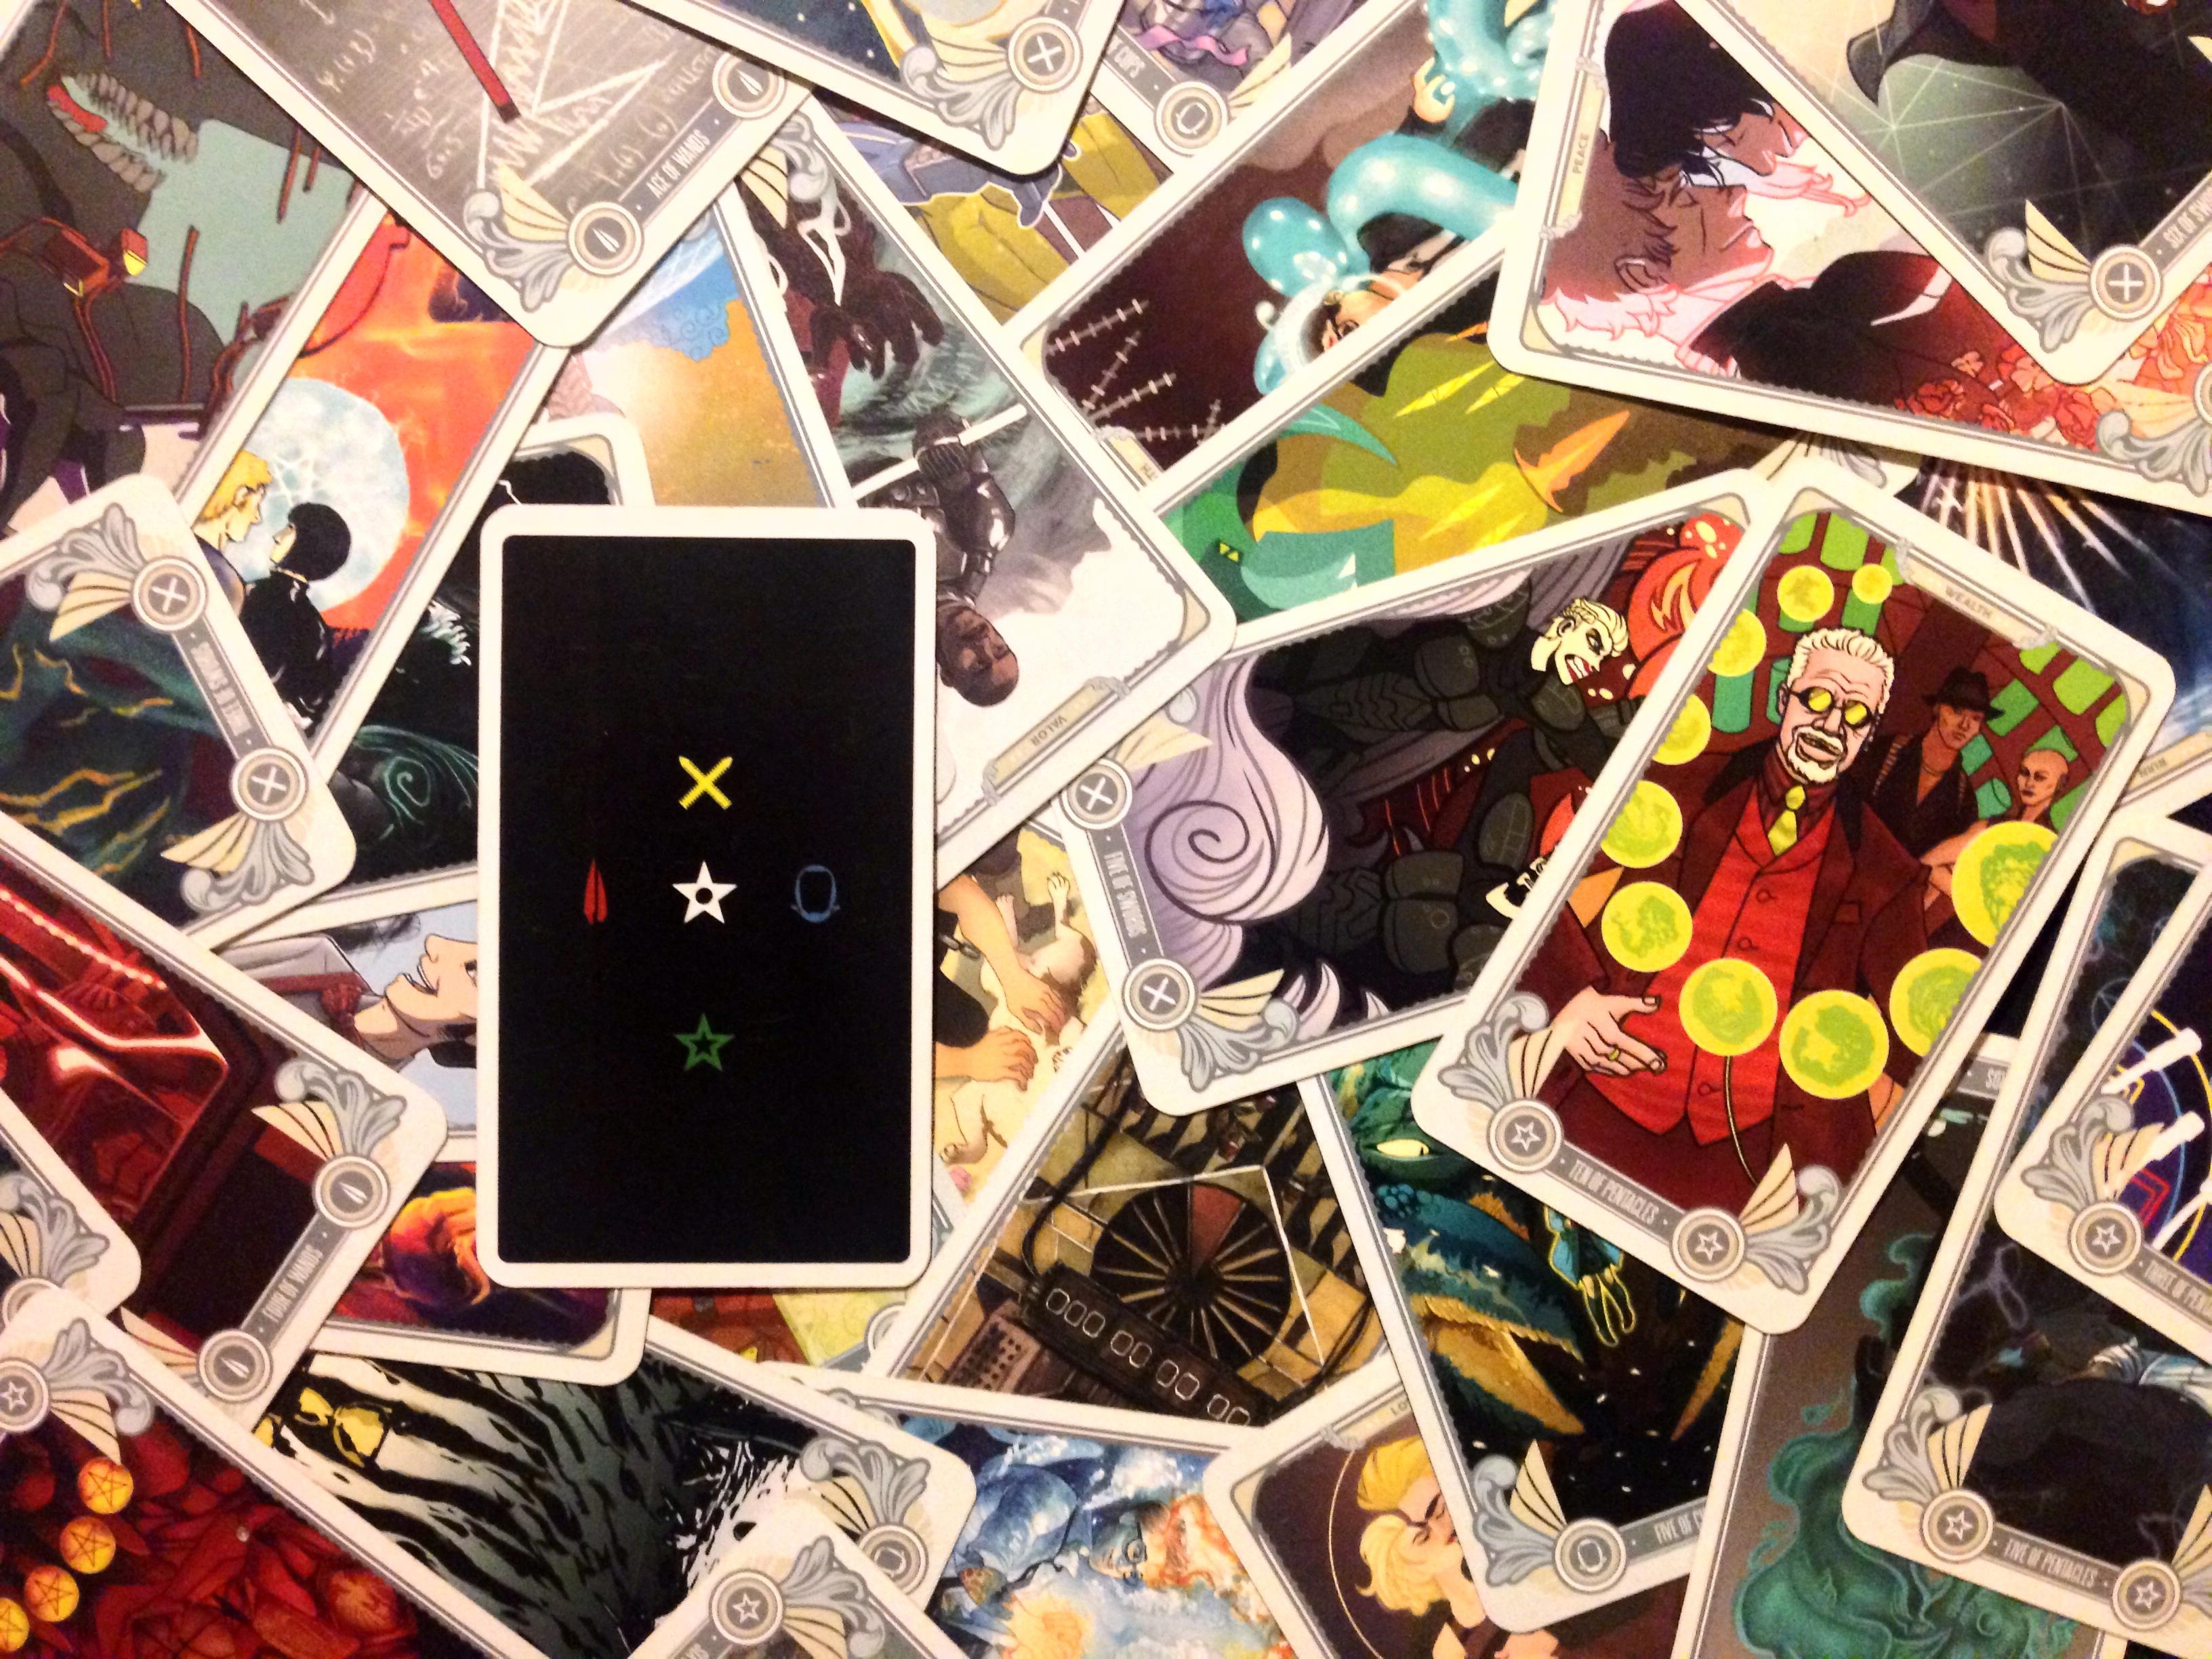 Full Card Gallery